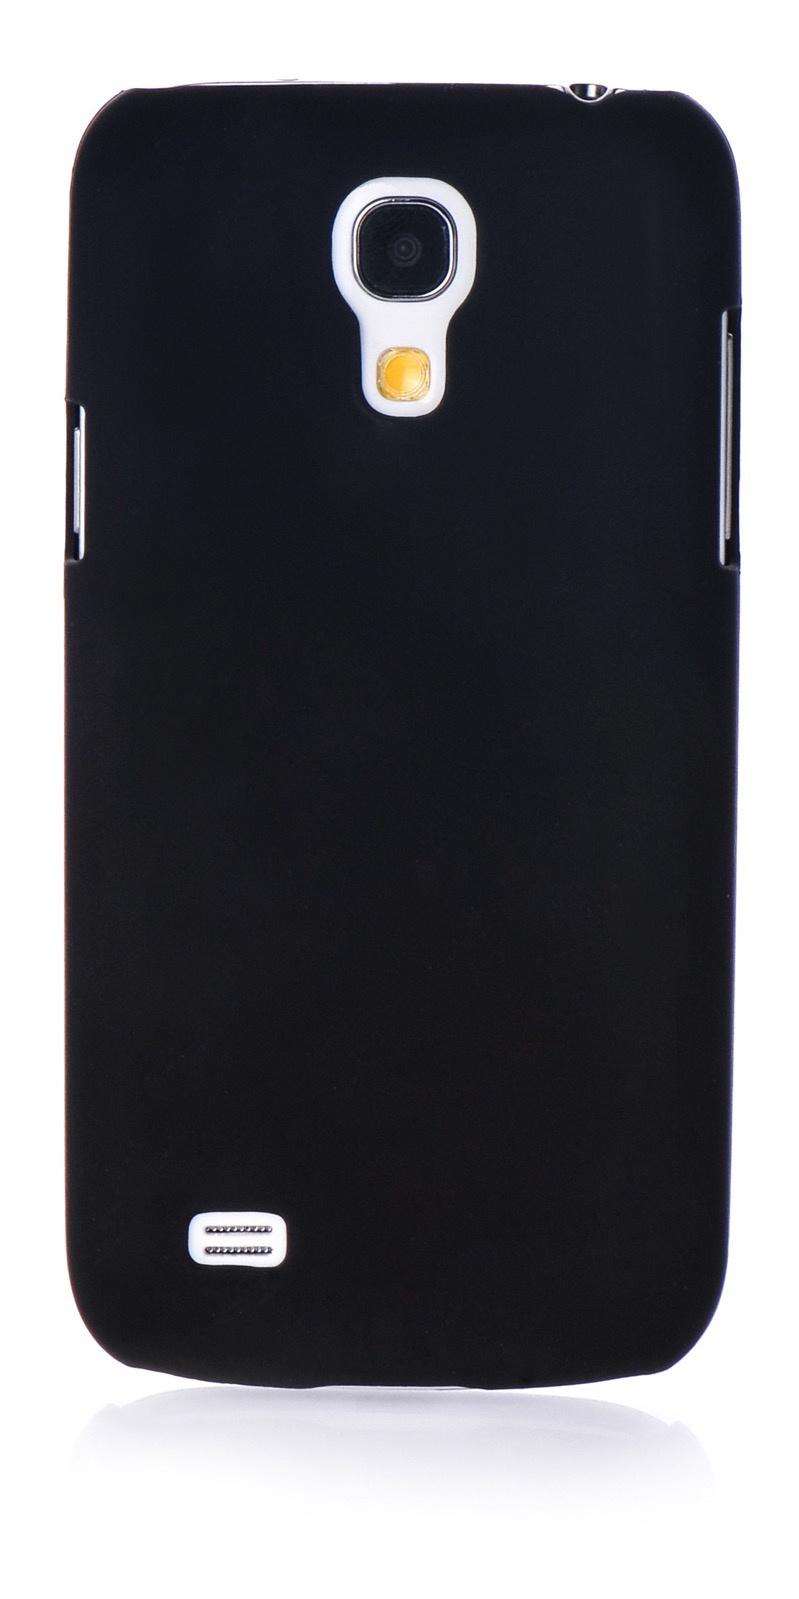 Чехол для сотового телефона iNeez накладка пластик soft touch black для Samsung Galaxy S4 mini, черный